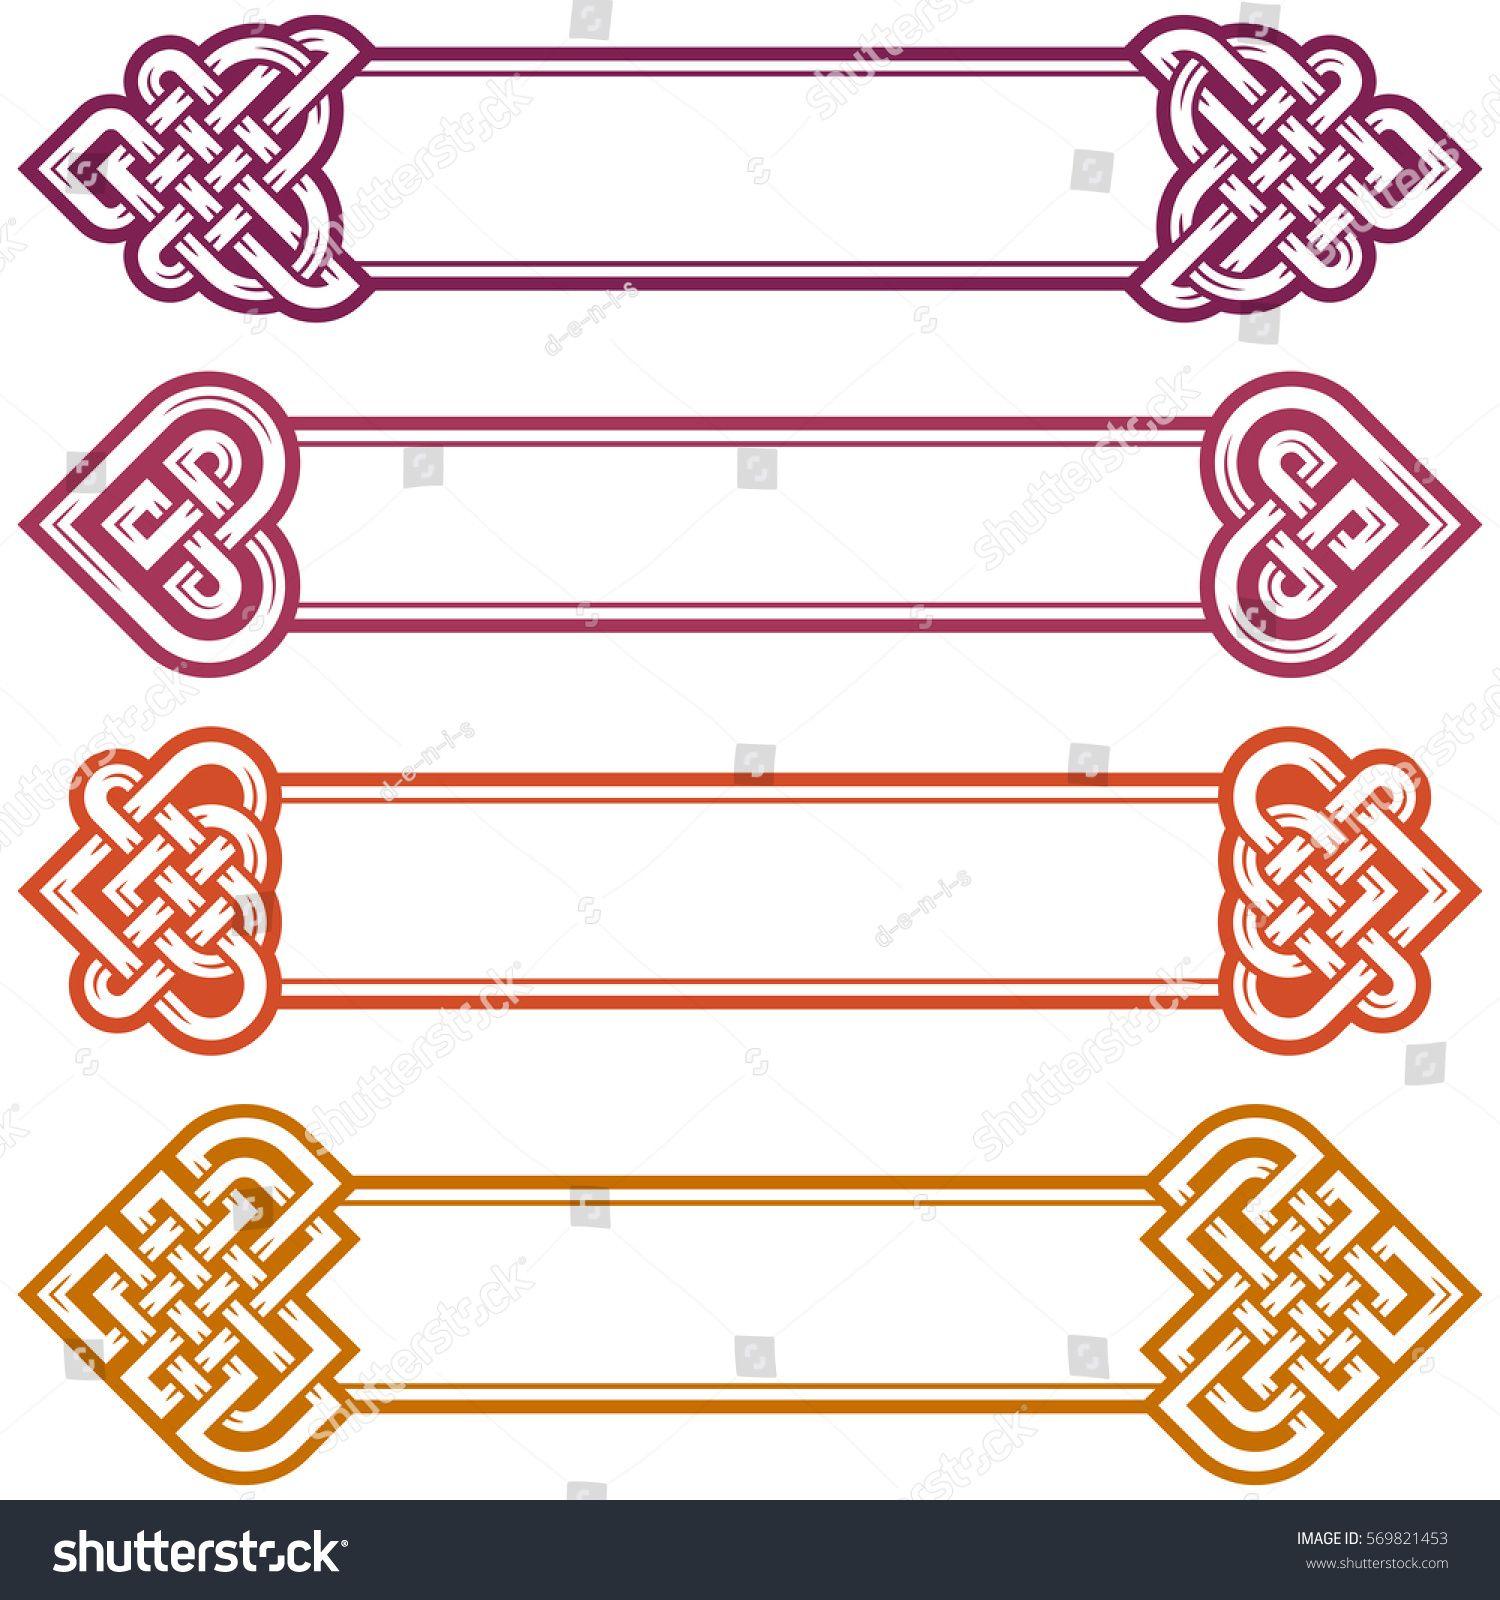 Vector Irish Frame Set Design Elements Of Celtic Knot In